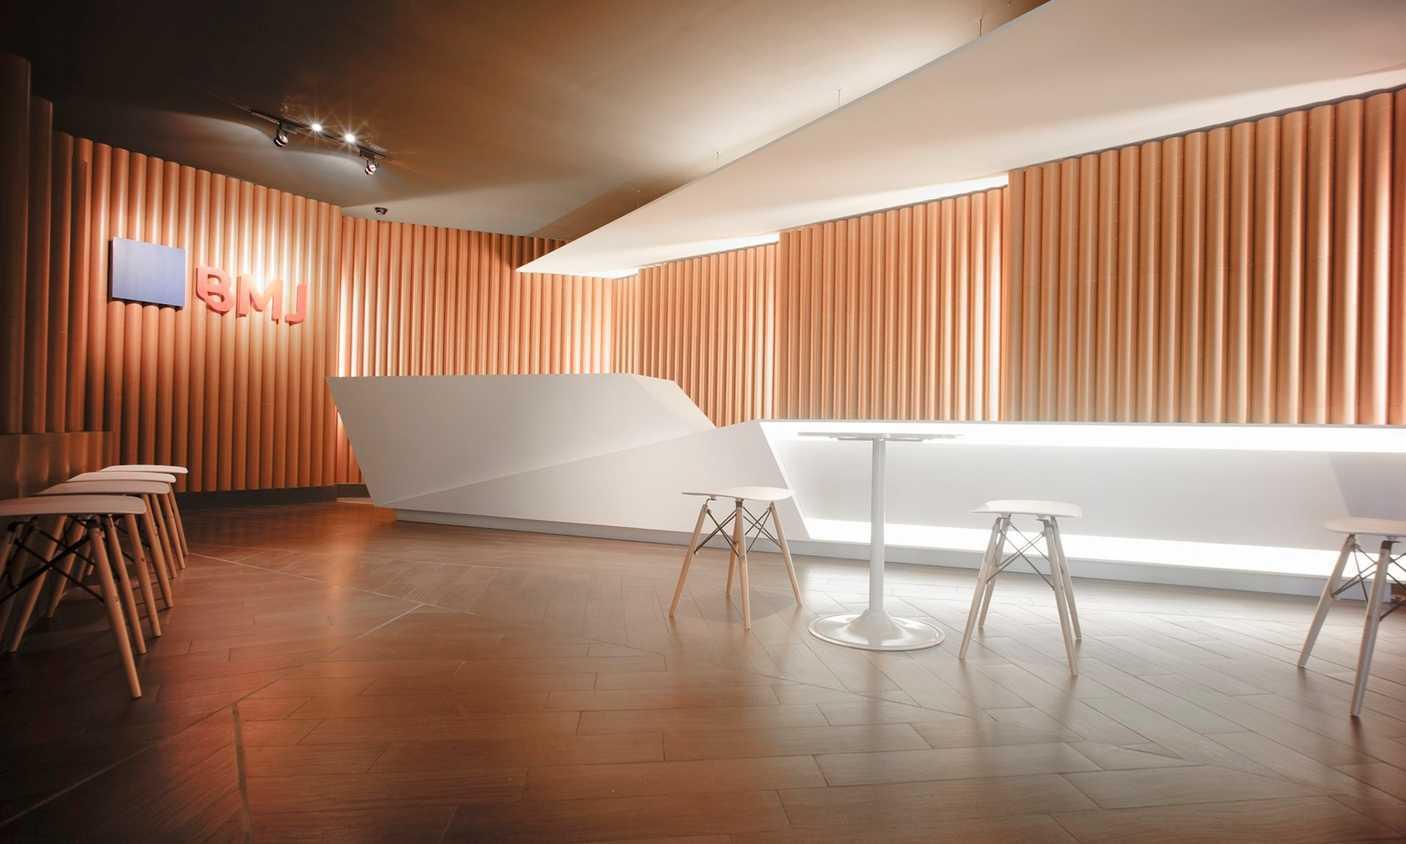 Ari Wibowo Design (Aw.d) Bmj Hq Karawang Karawang Lobby Modern 11380